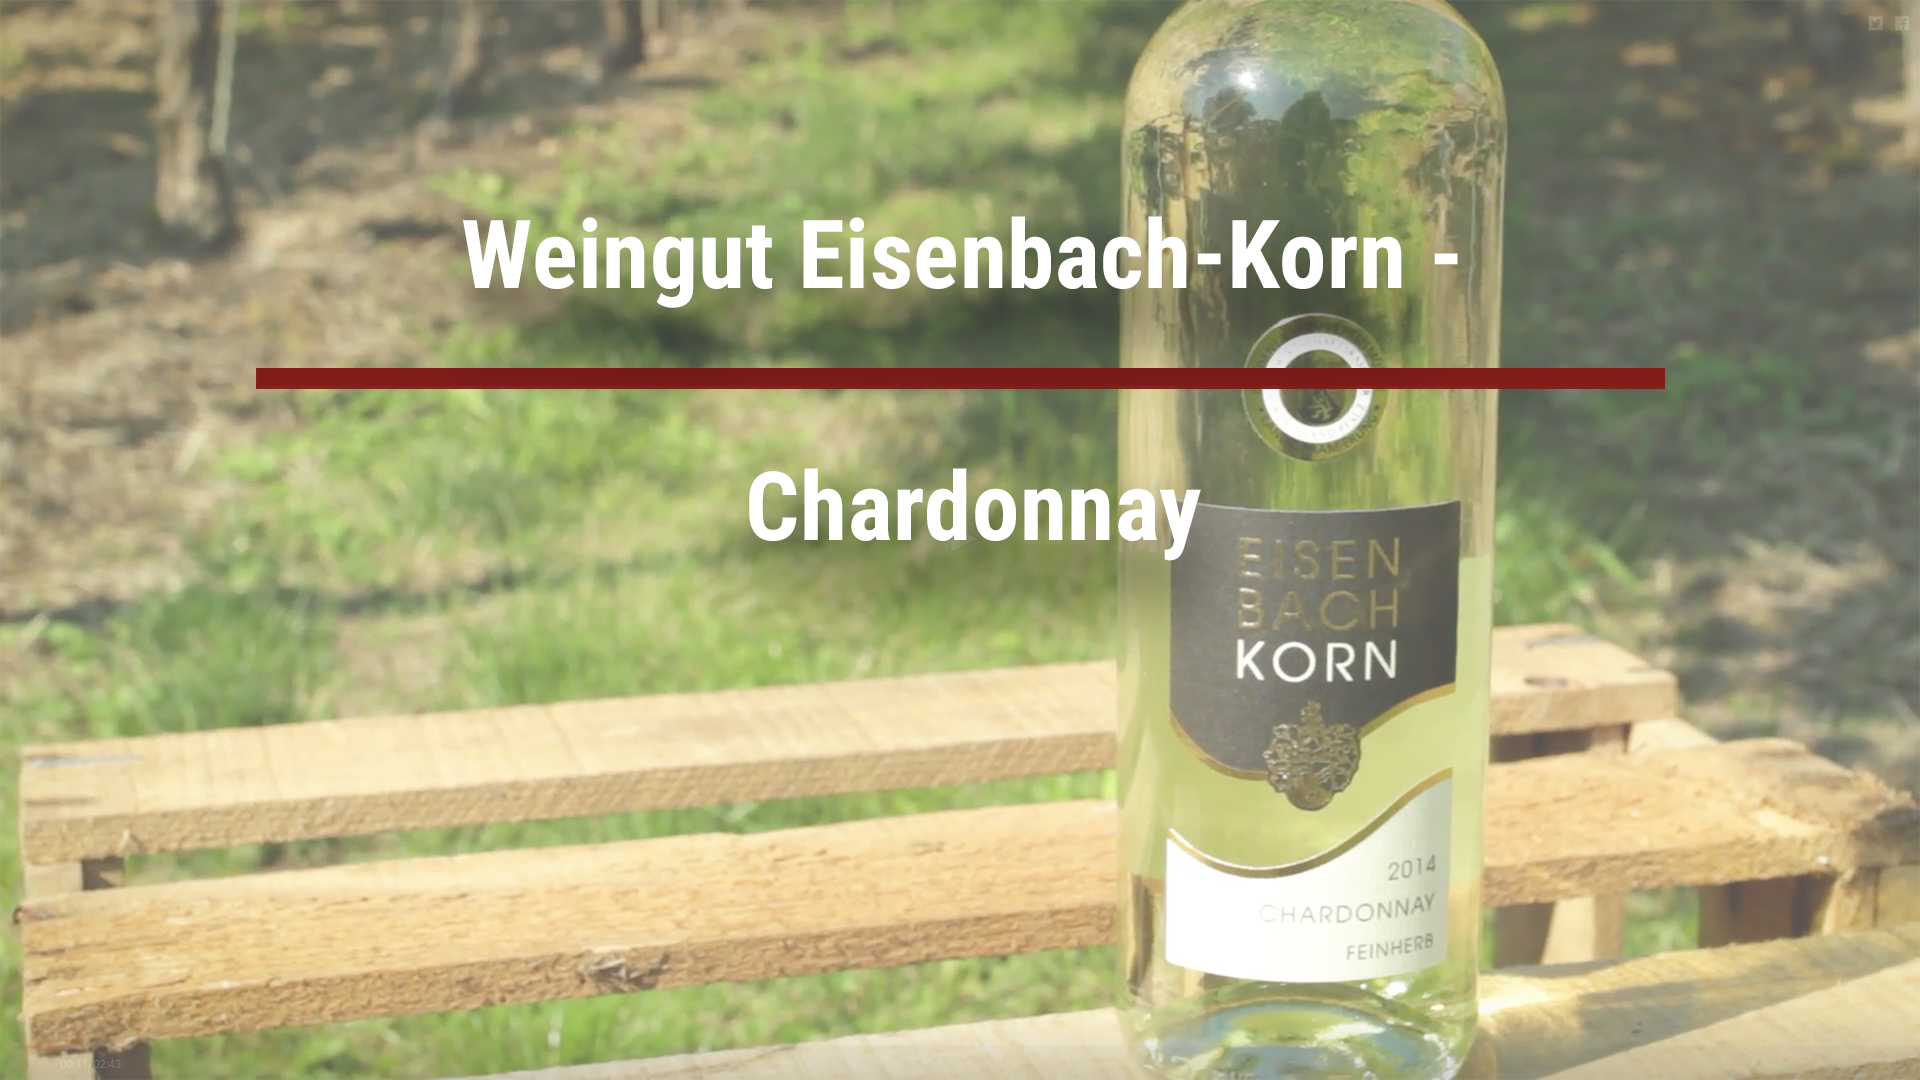 Winery Eisenbach-Korn – Chardonnay